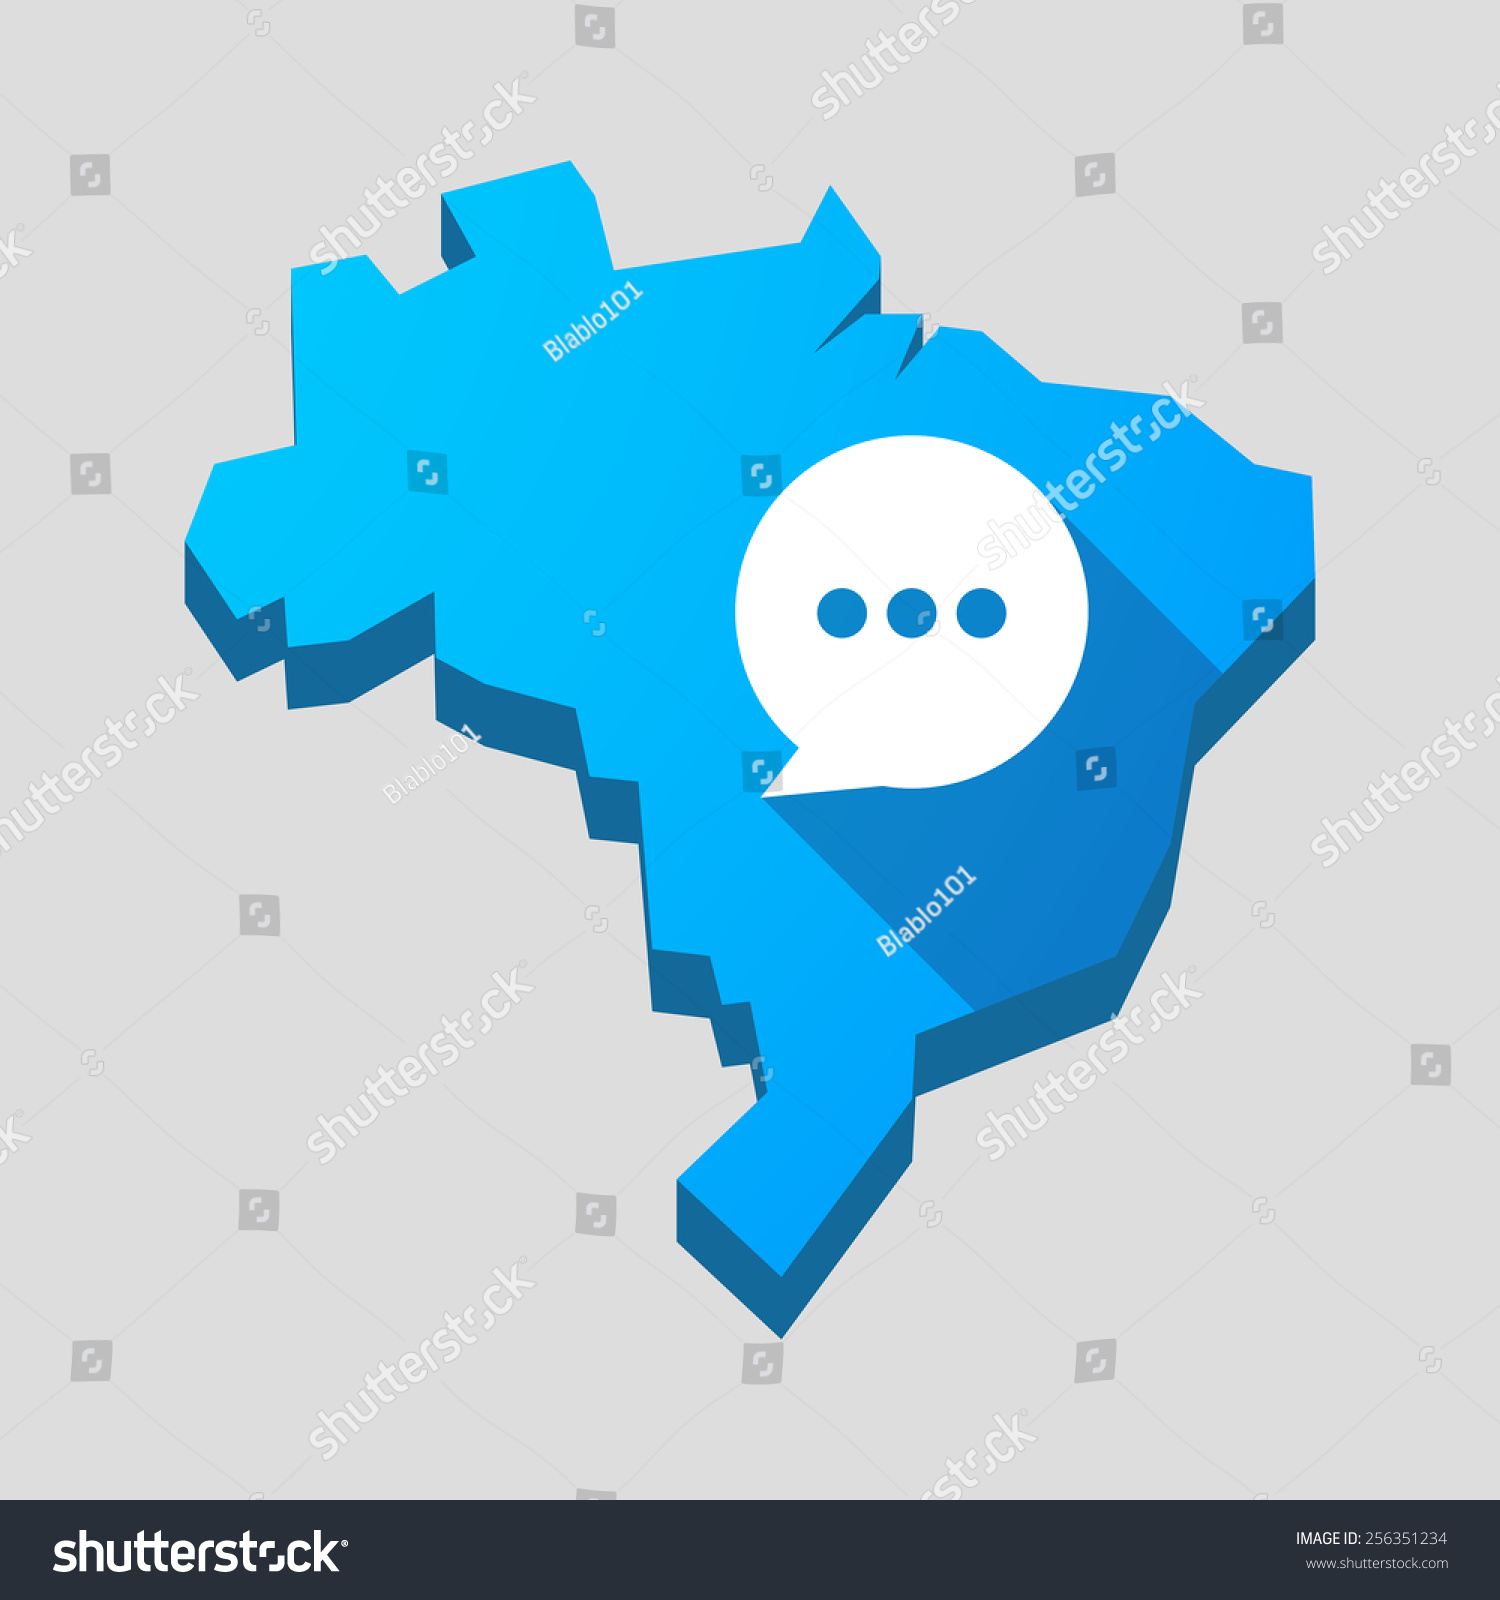 Illustration Blue Brazil Map Comic Balloon Stock Vector - Brazil map illustration